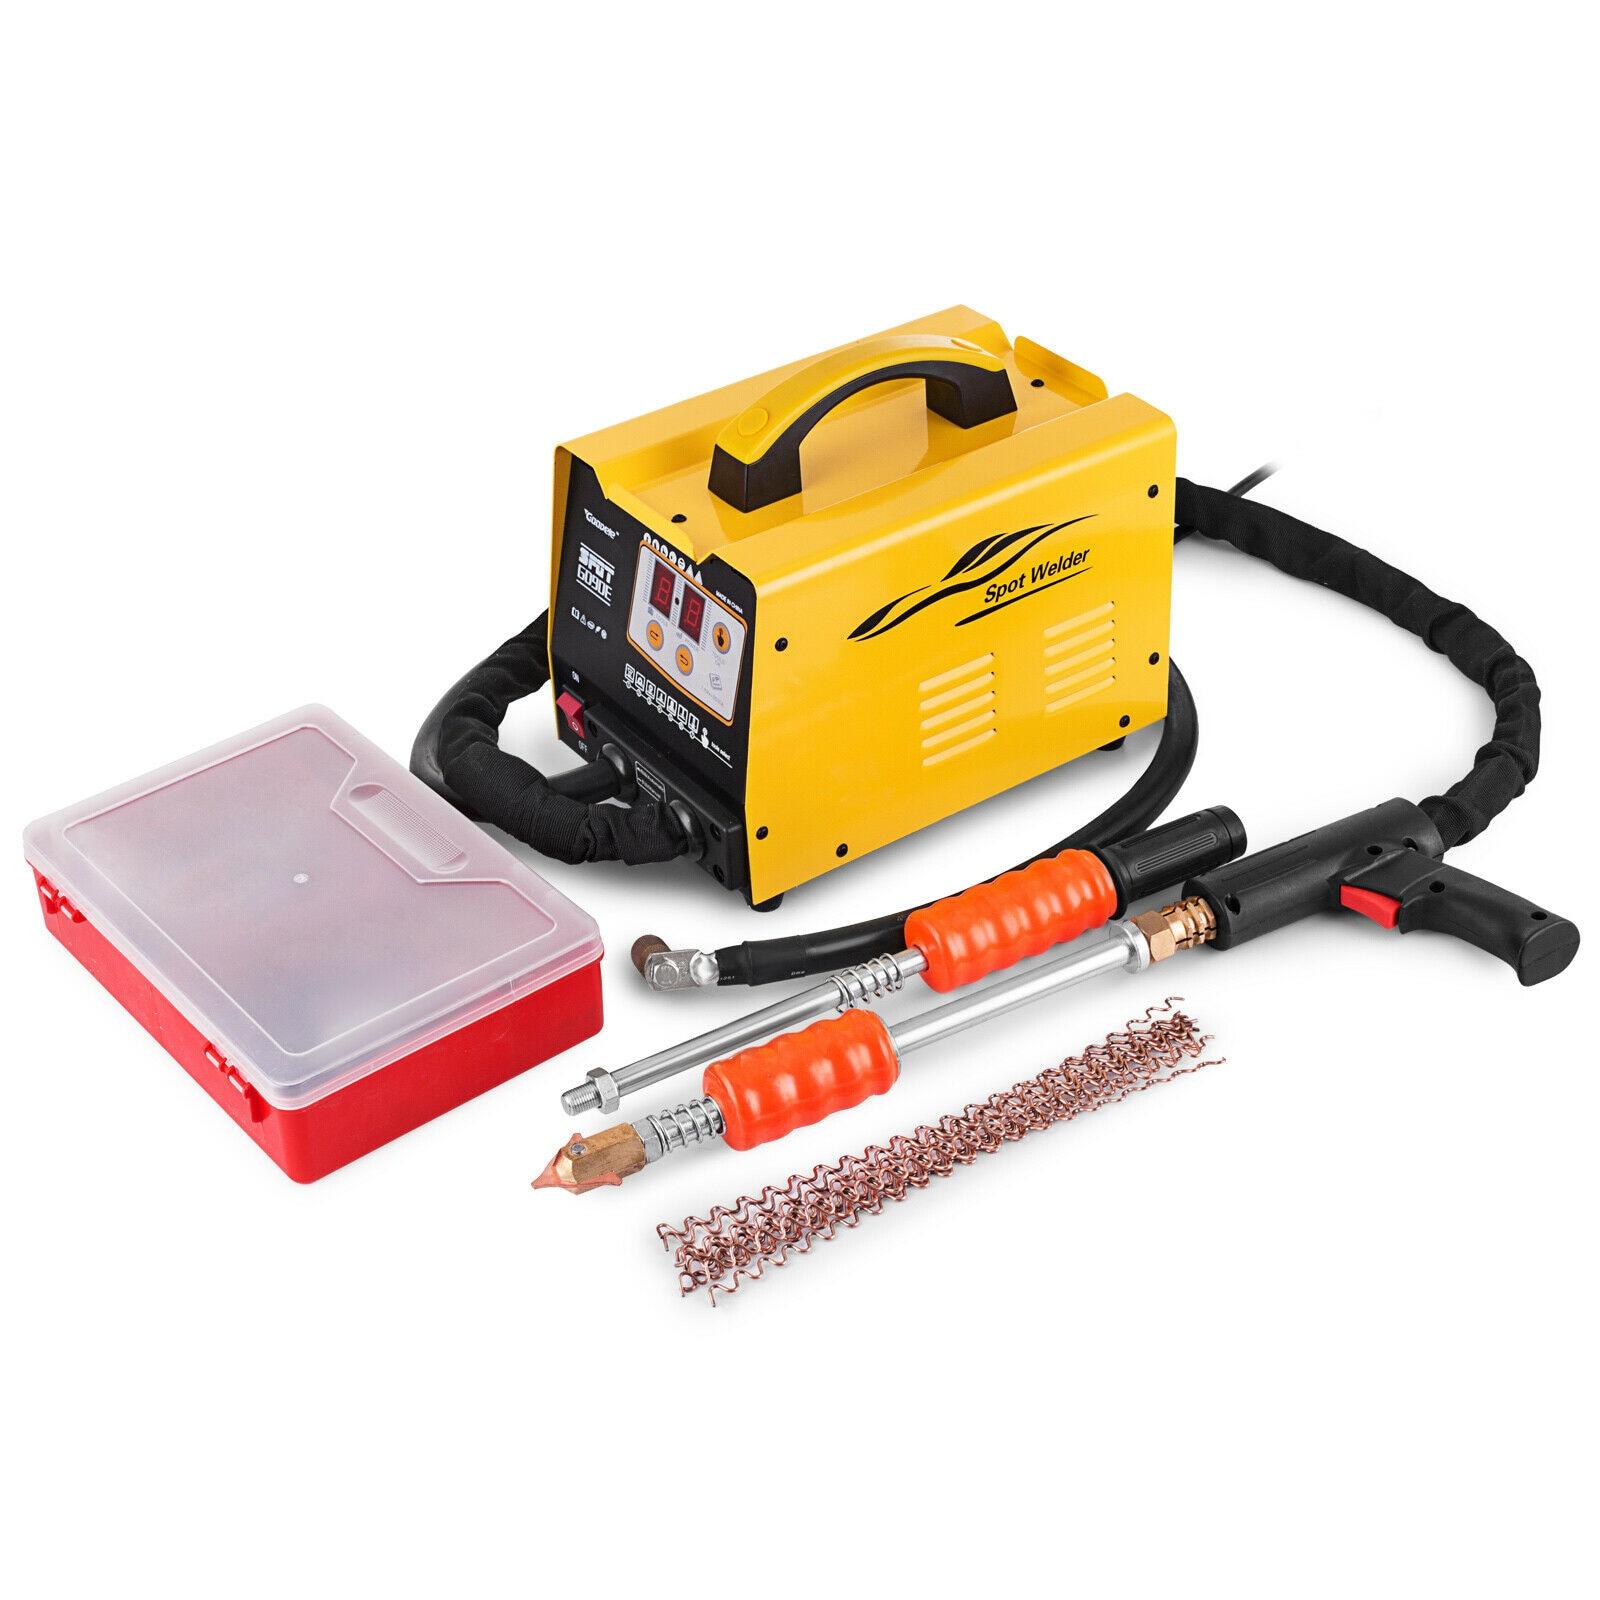 G90E Vehicle Panel Spot Puller Dent Repair Welder Bonnet Door Repair Tool